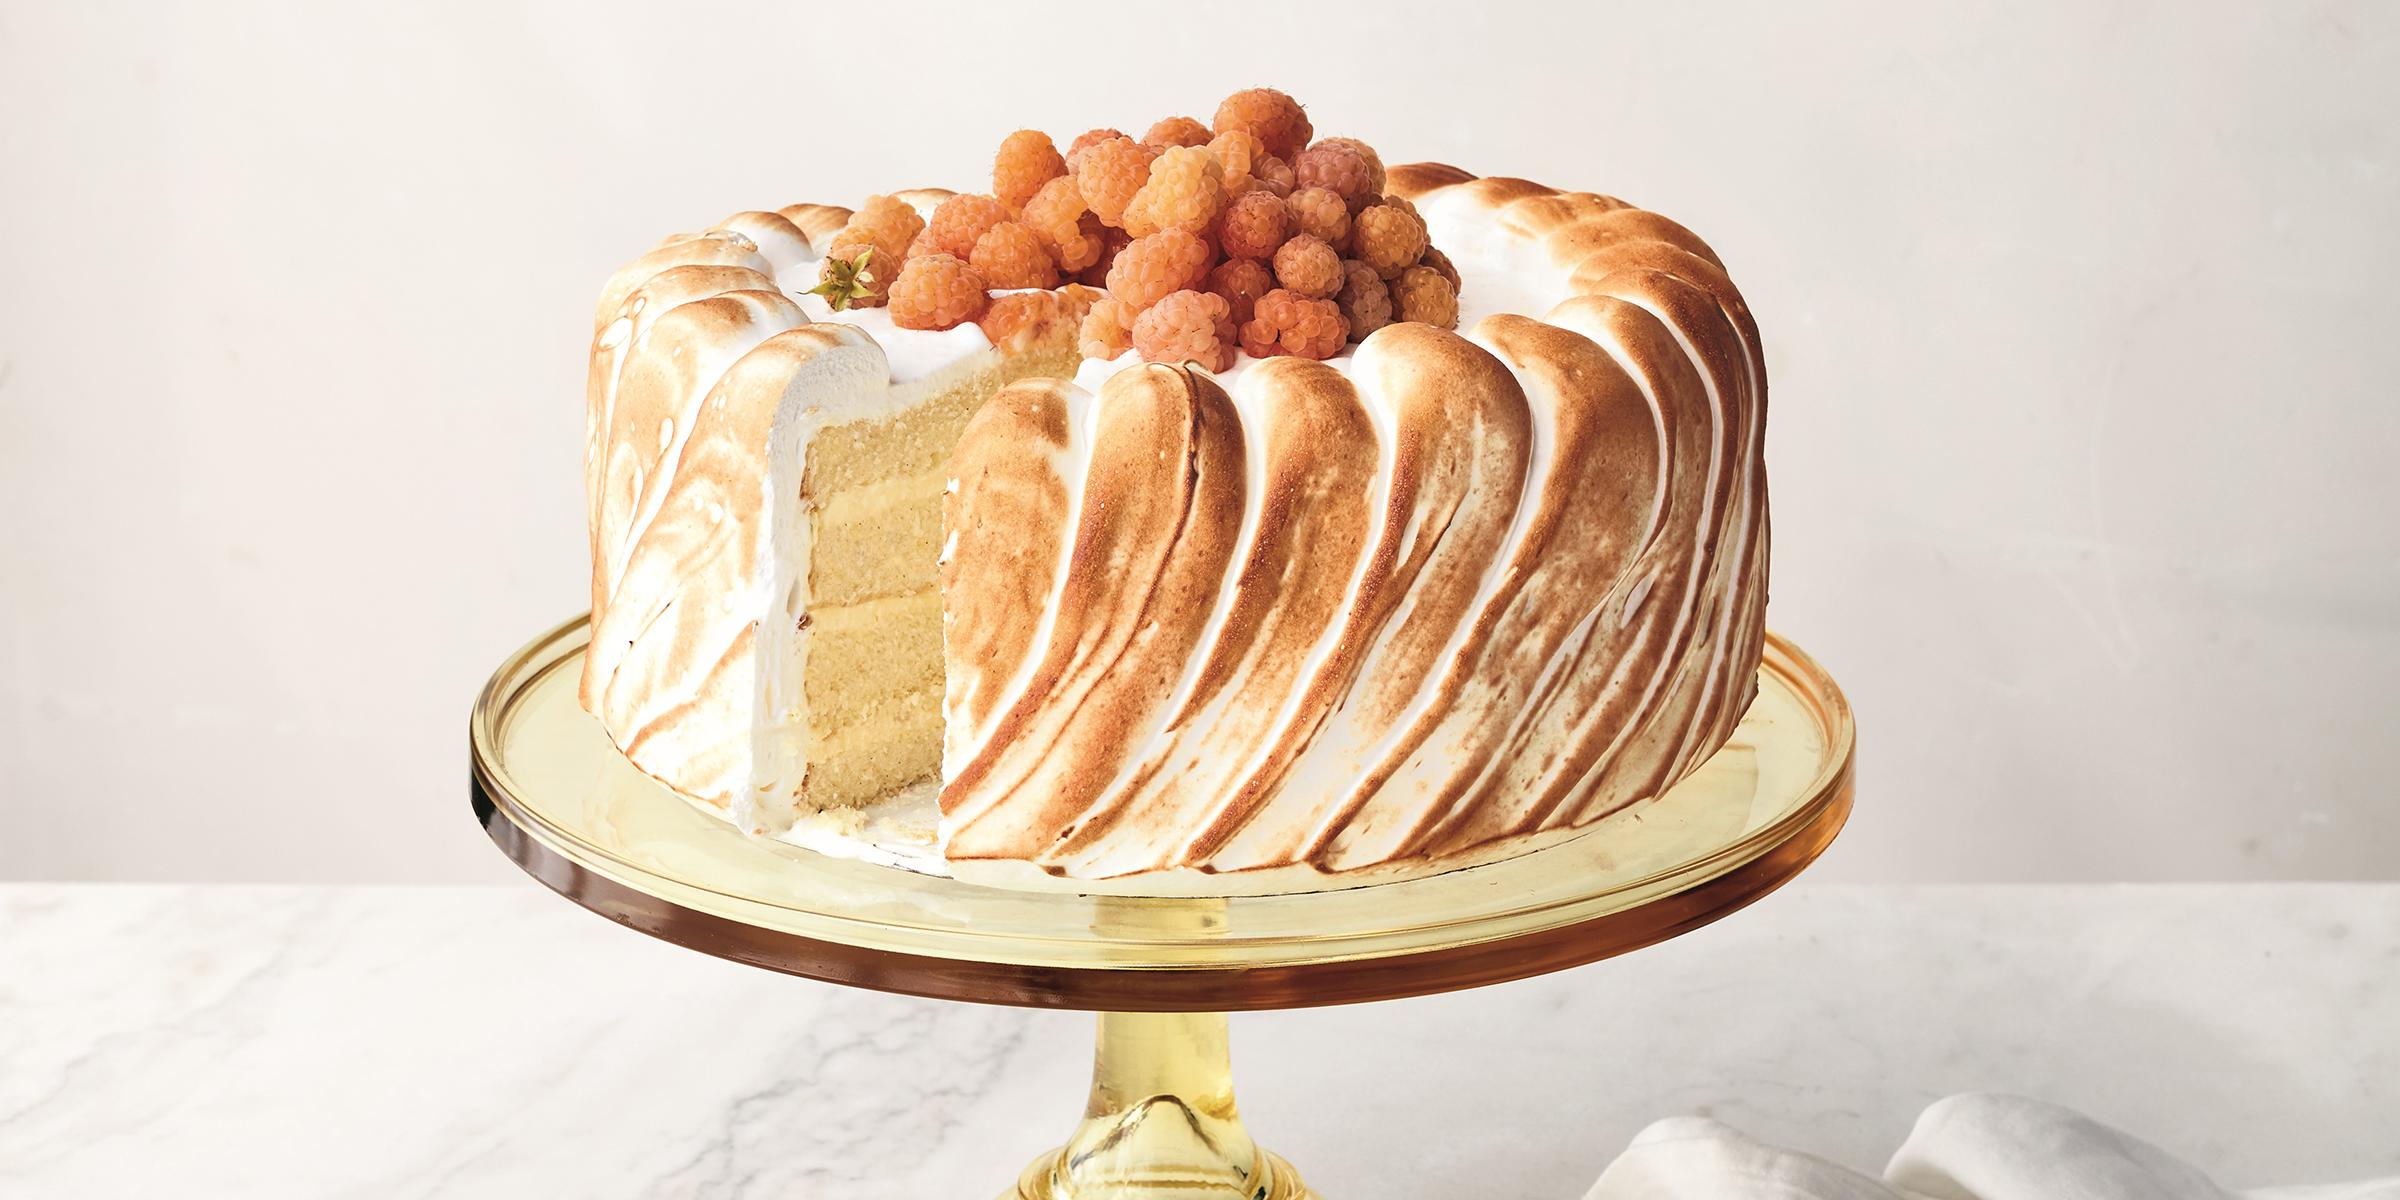 Martha Stewart's lemon mousse cake is light as air